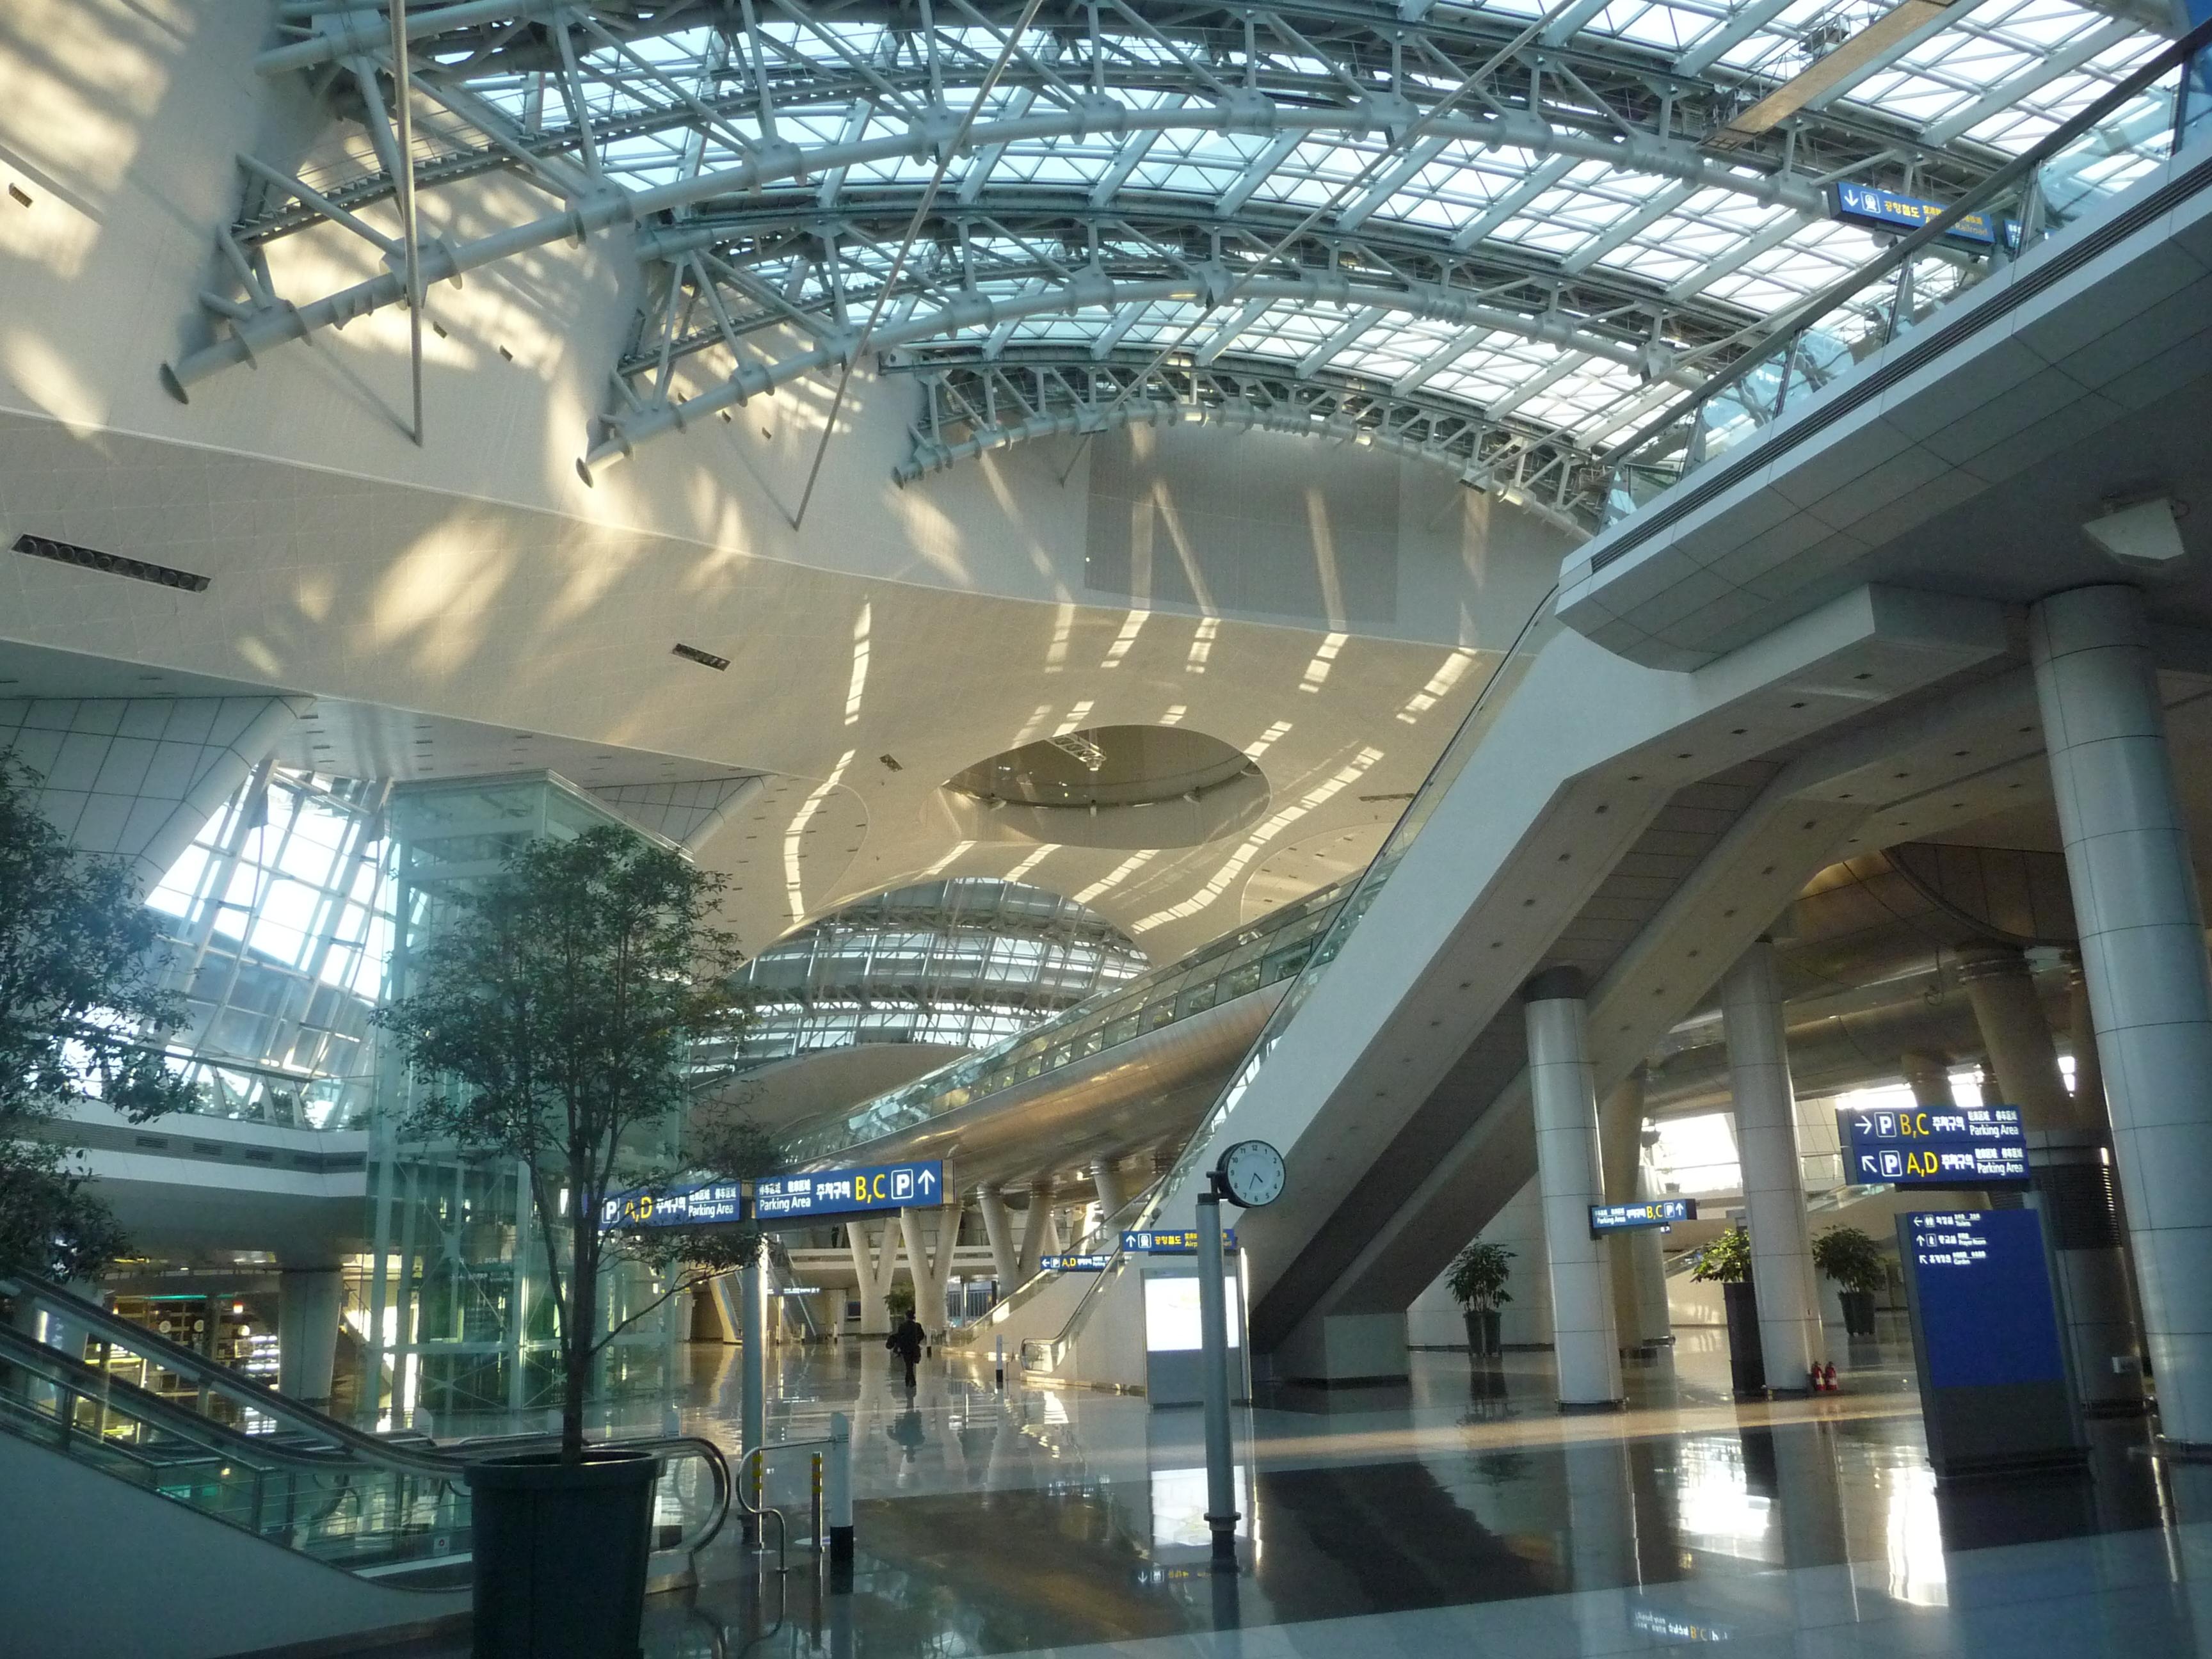 File:Incheon airport.jpg - Wikimedia Commons